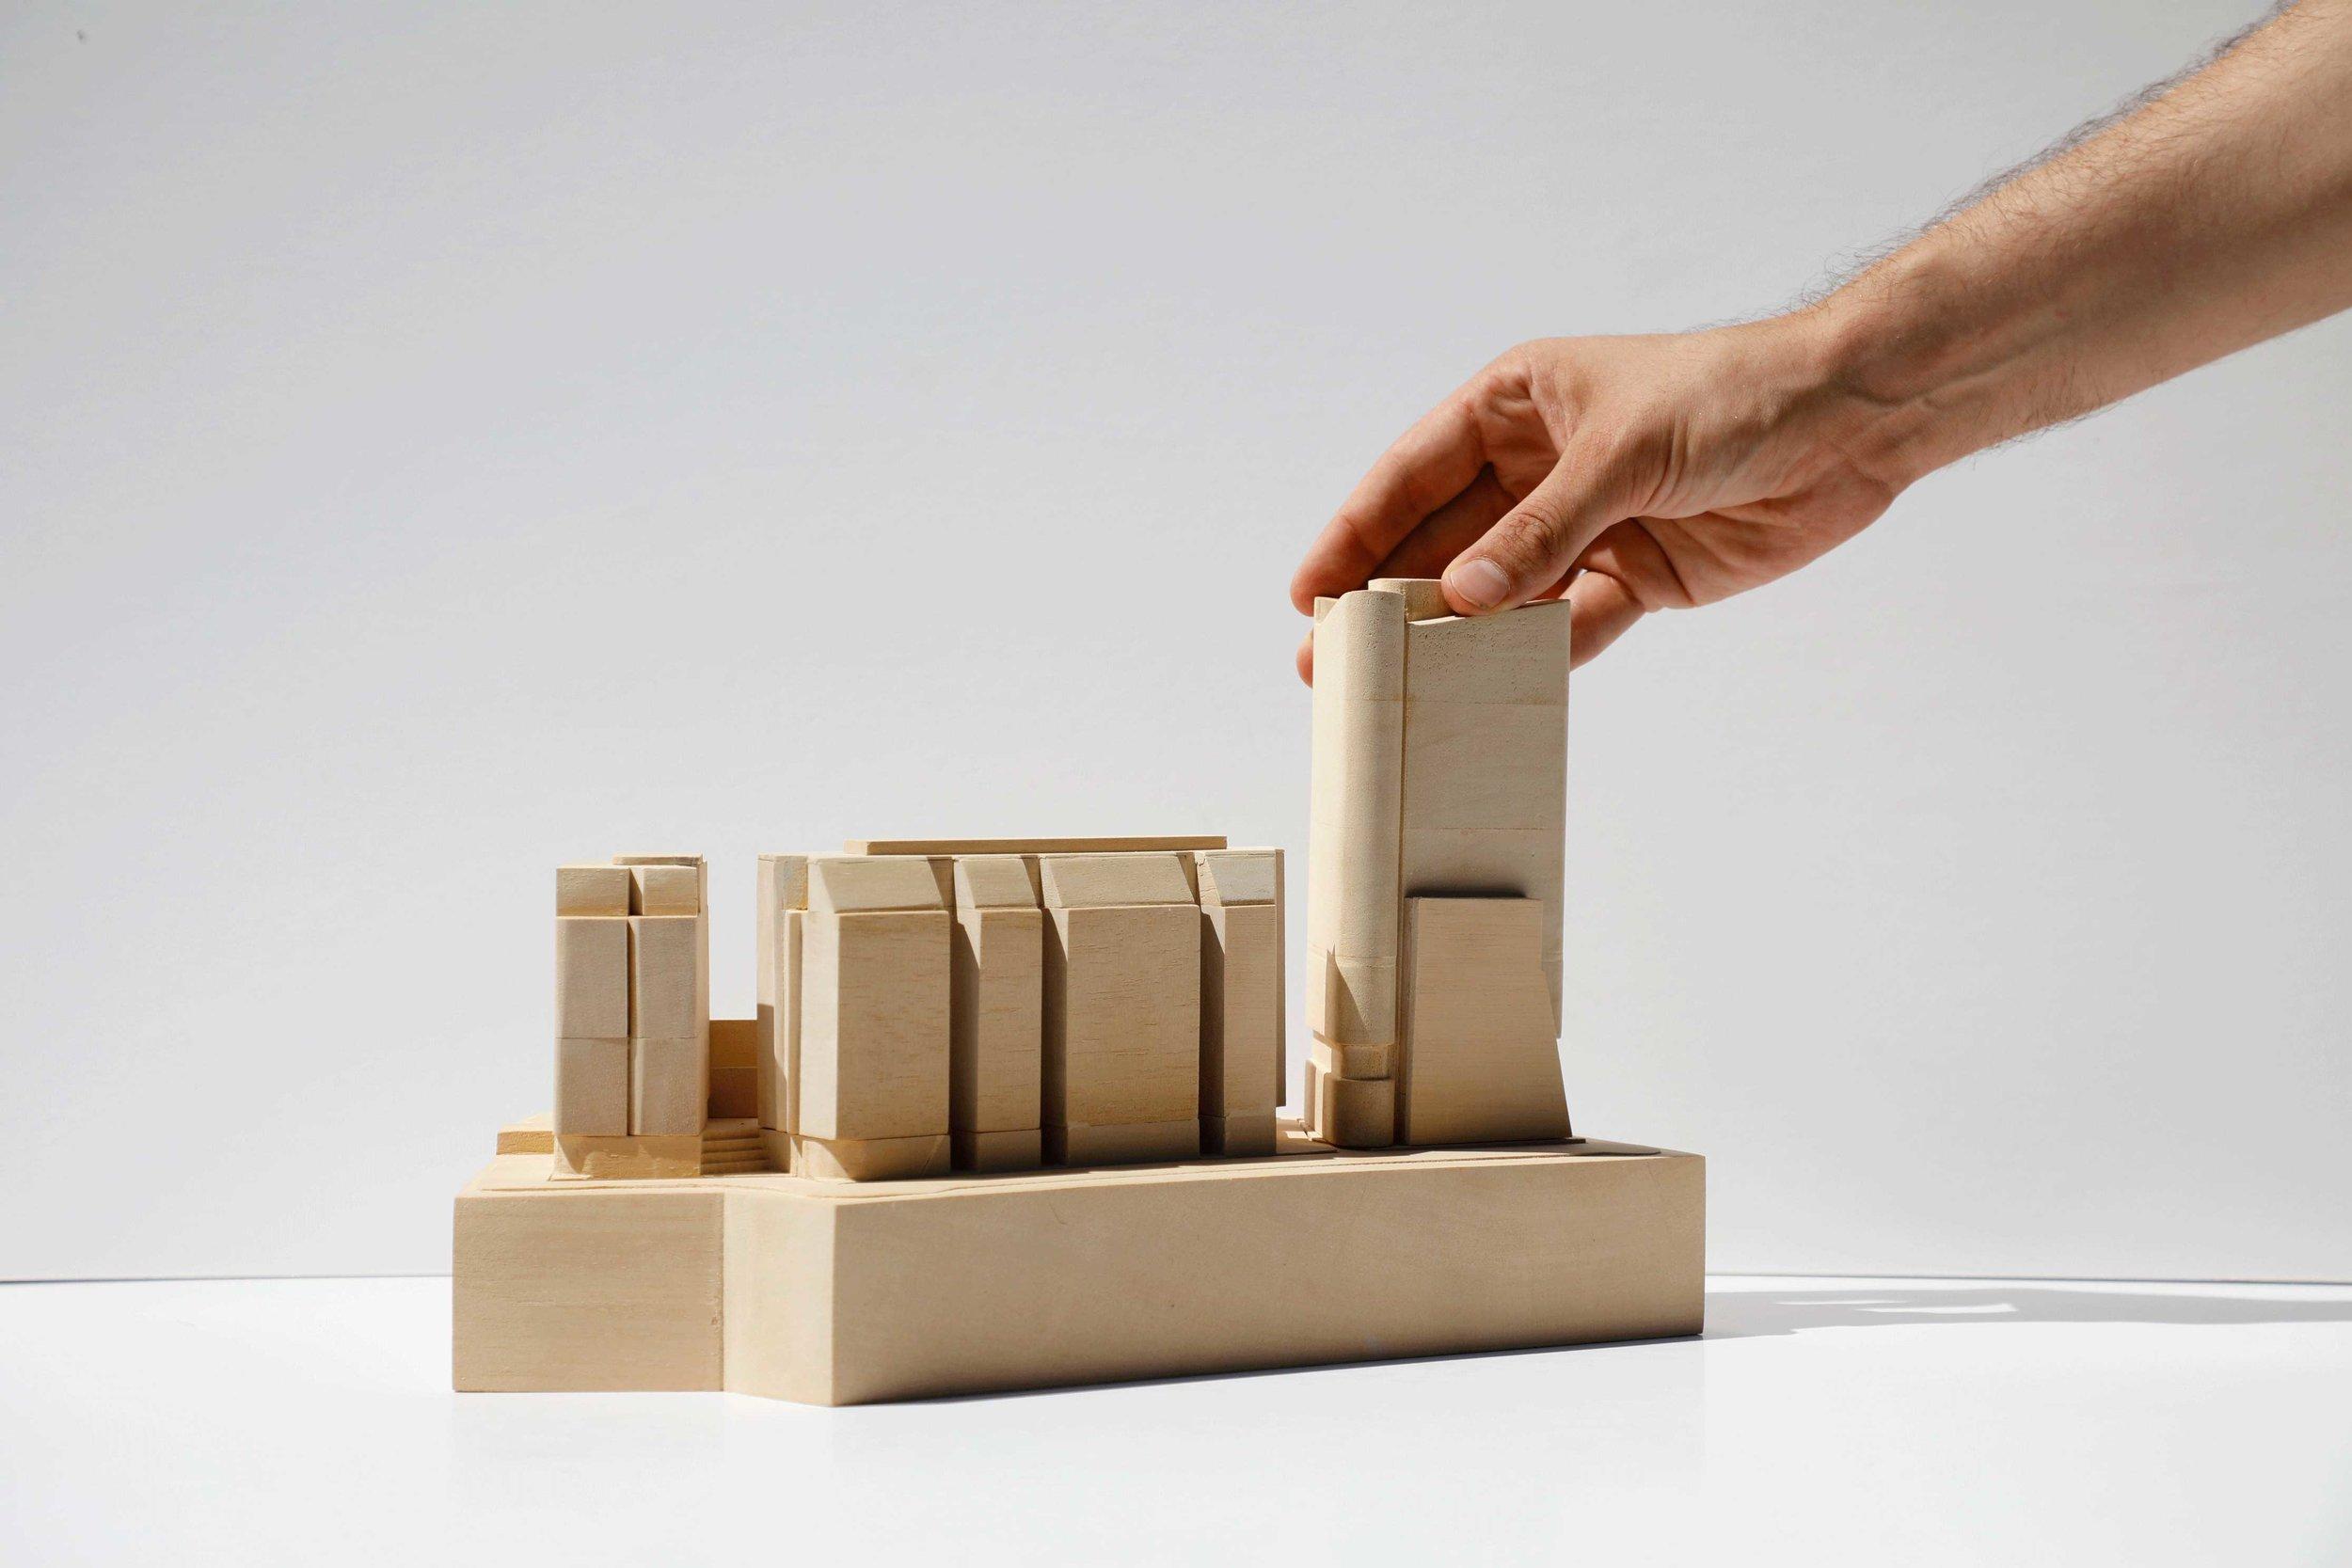 Presentation_model_Smart_design_studio_COAP_Architecture_Make_models.jpg